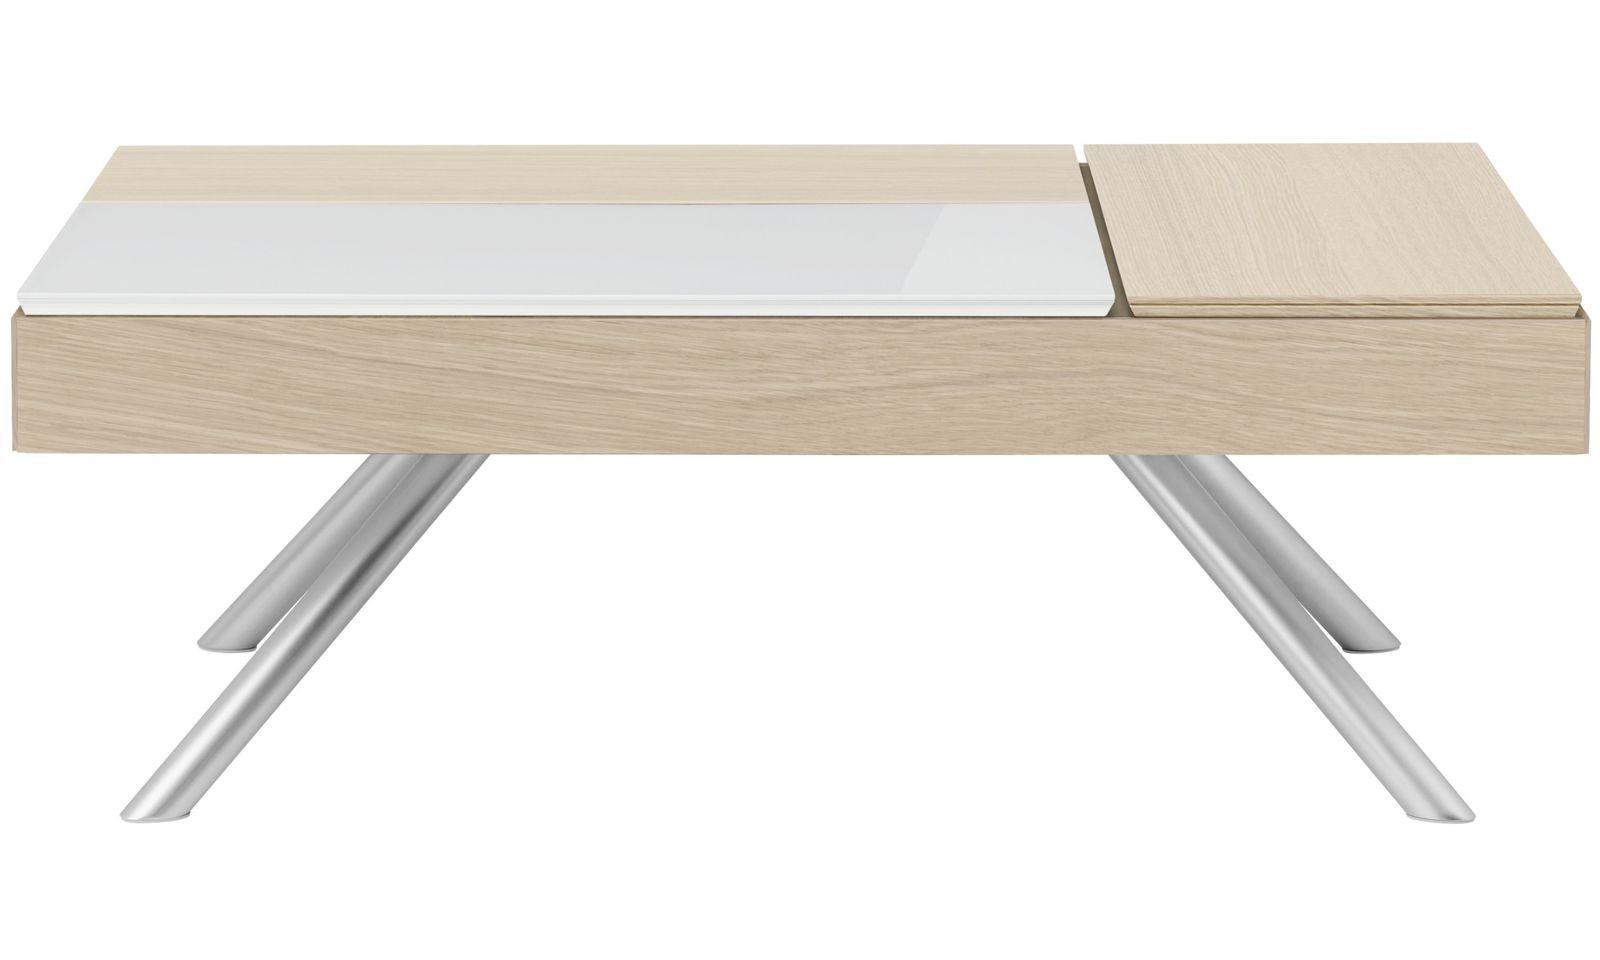 BoConcept Chiva Modern Pop Up Hidden Storage Coffee Table